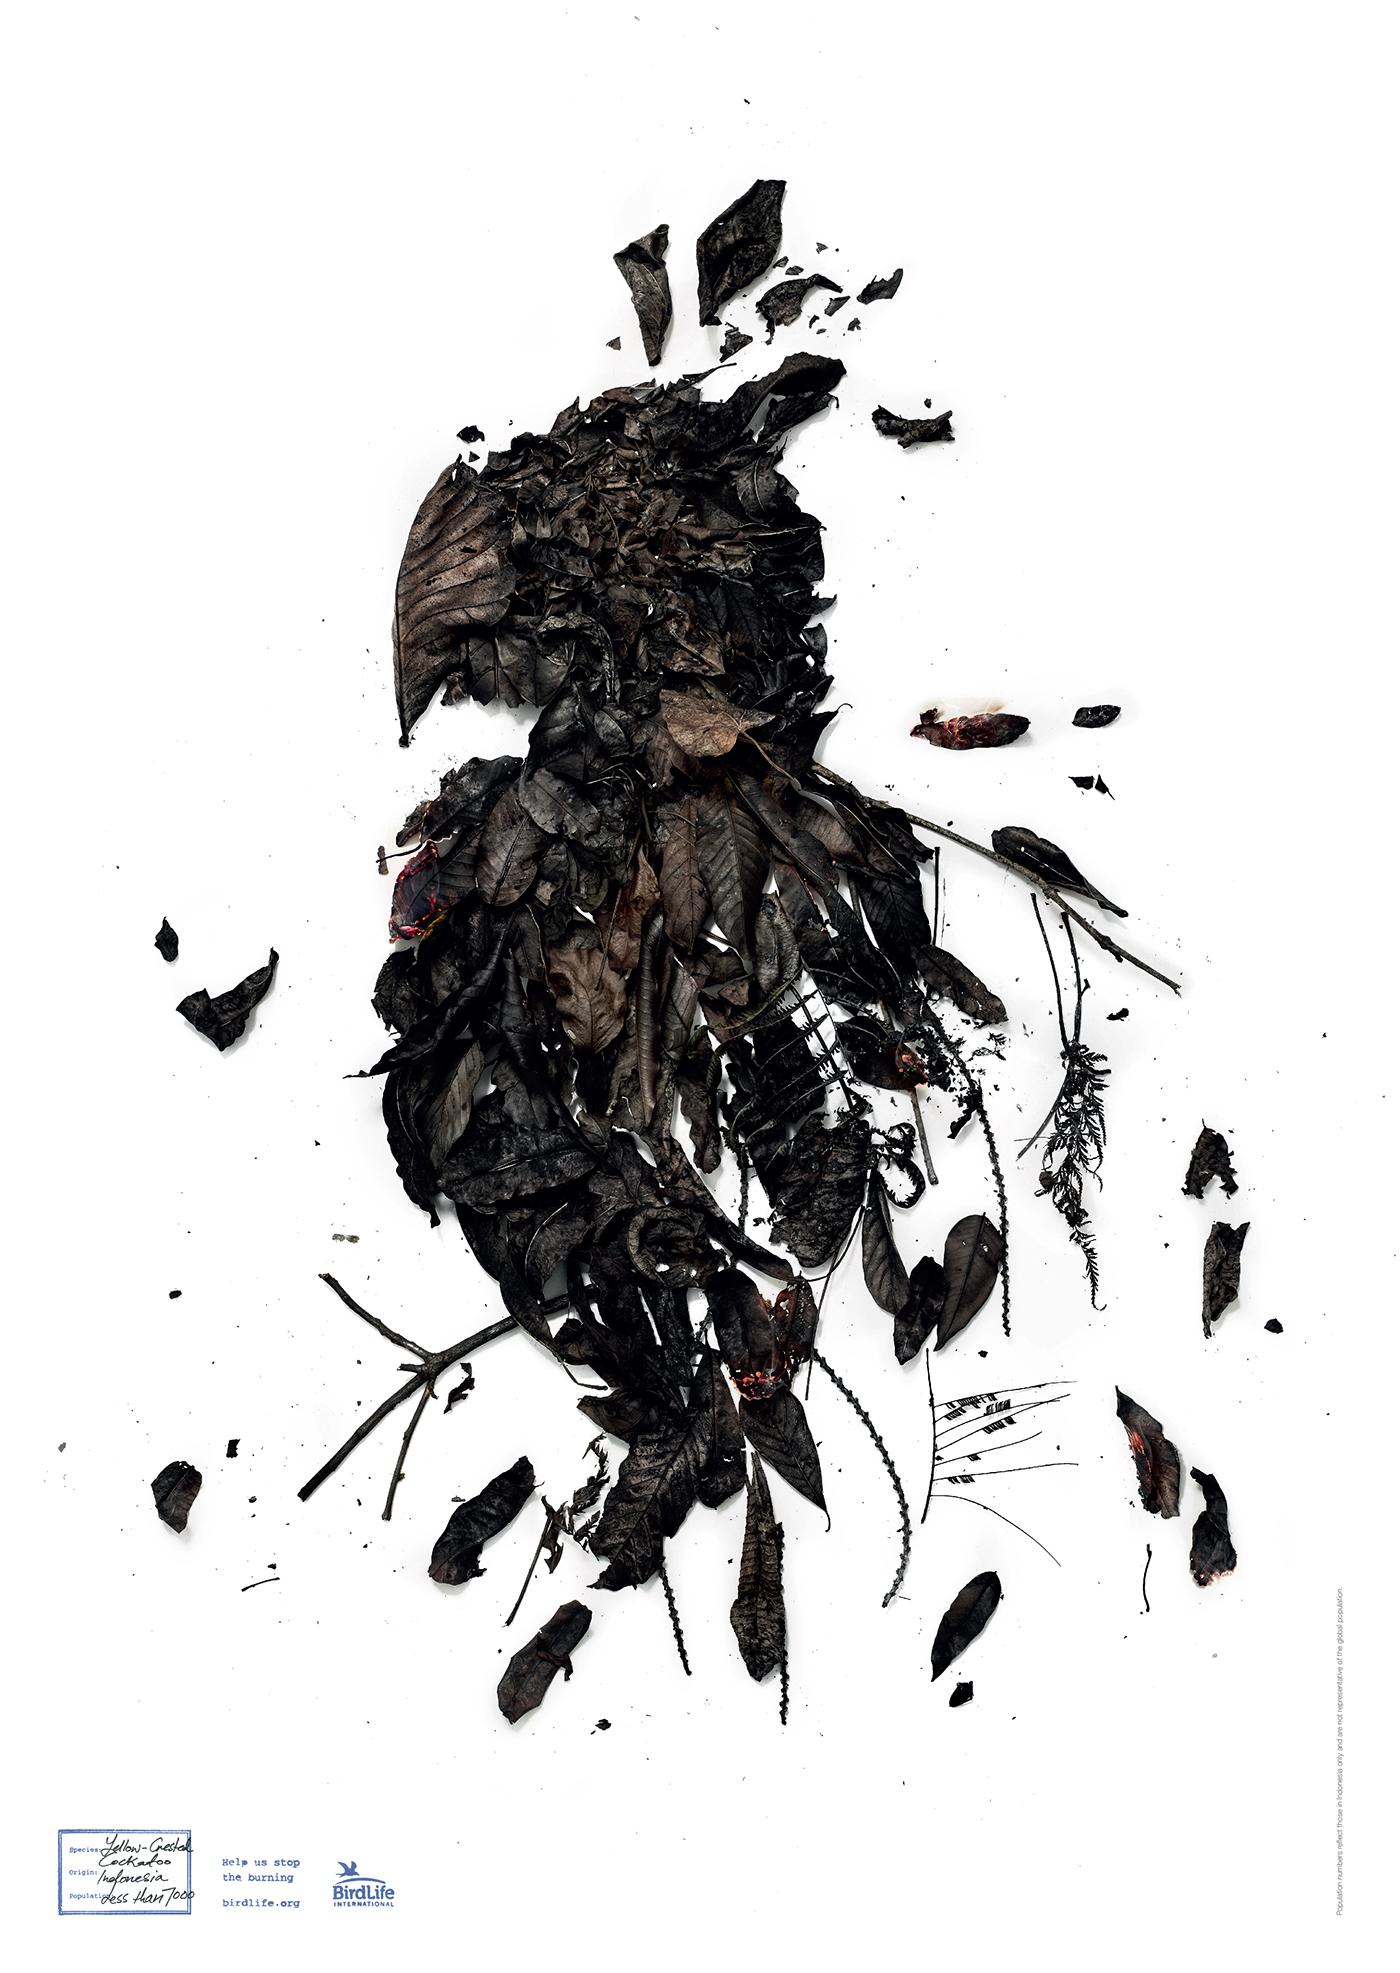 bird life indonesia birdlife Cockatoo owl kingfisher forest fire burnt